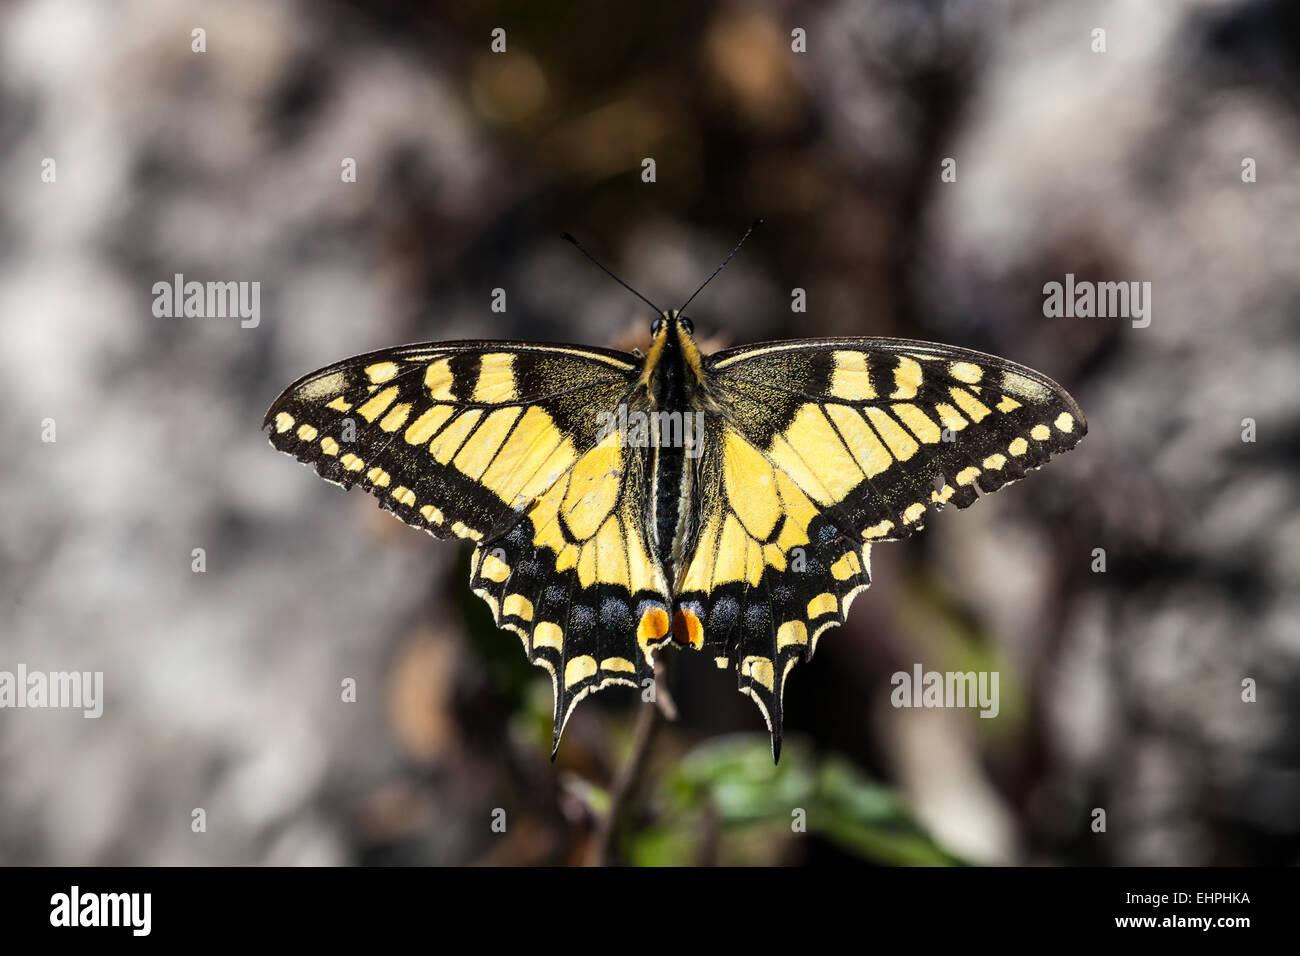 Old world swallowtail - Stock Image